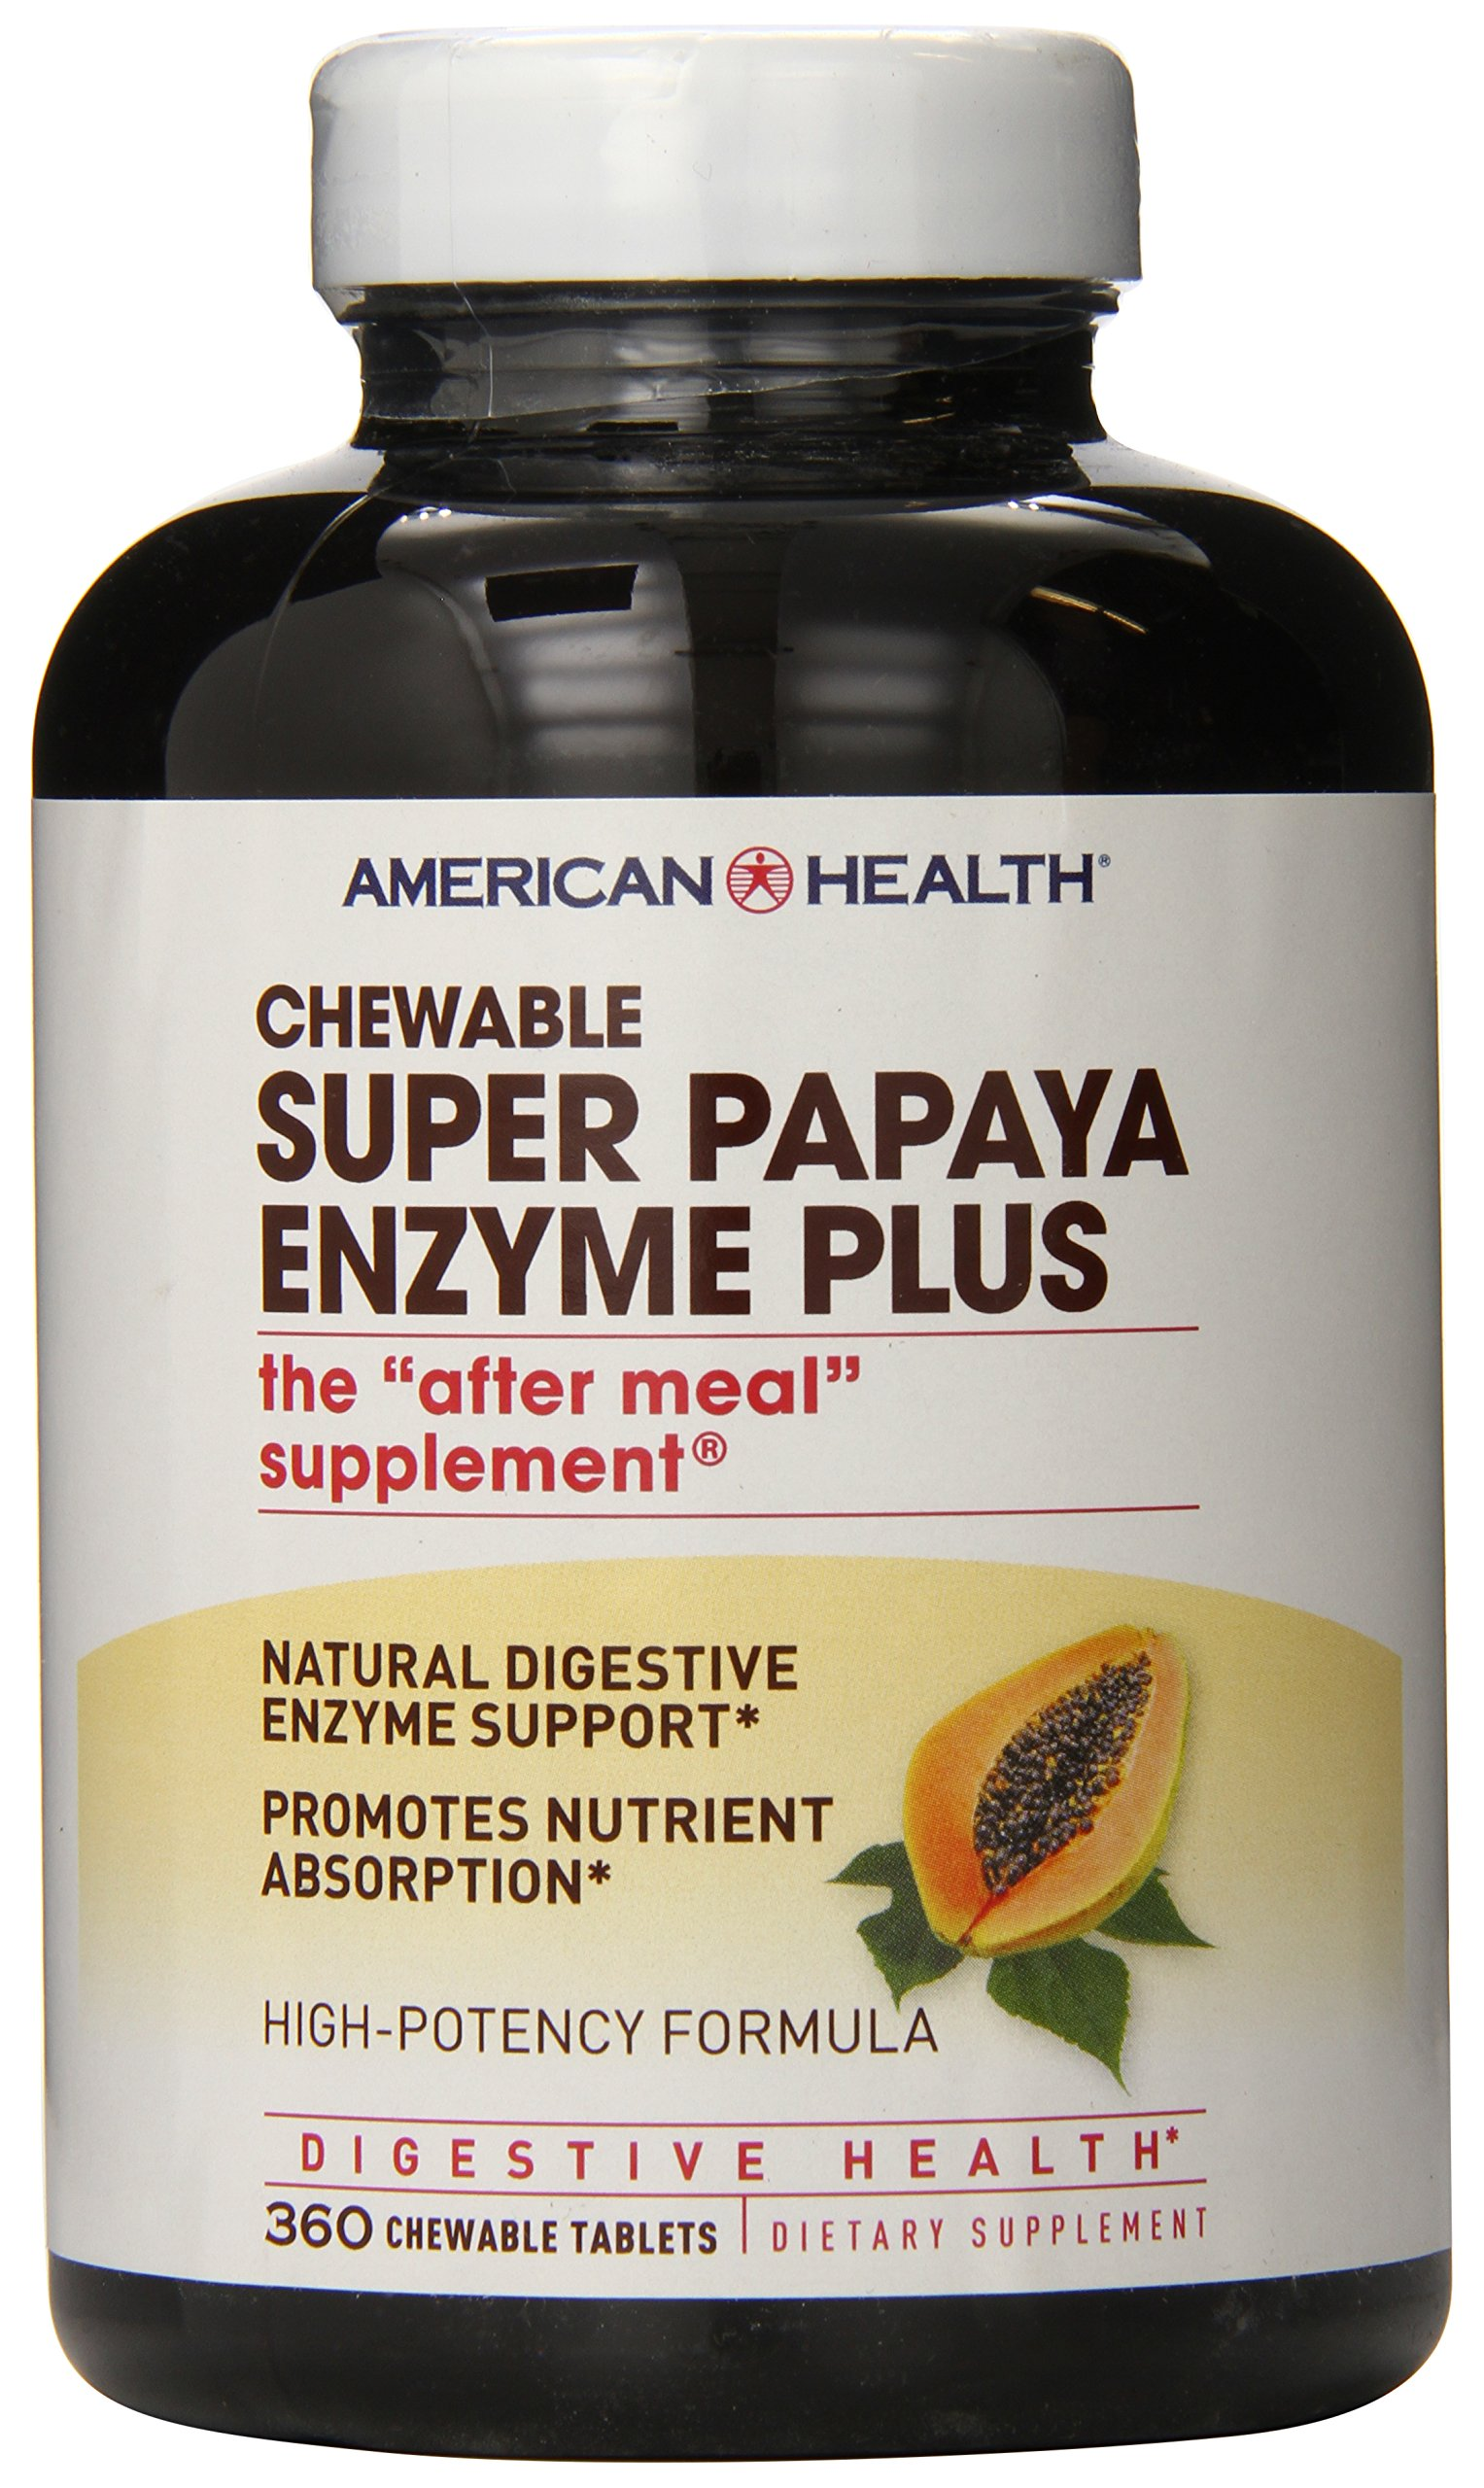 American Health Multi-Enzyme Plus, Super Papaya, 360 Count by American Health